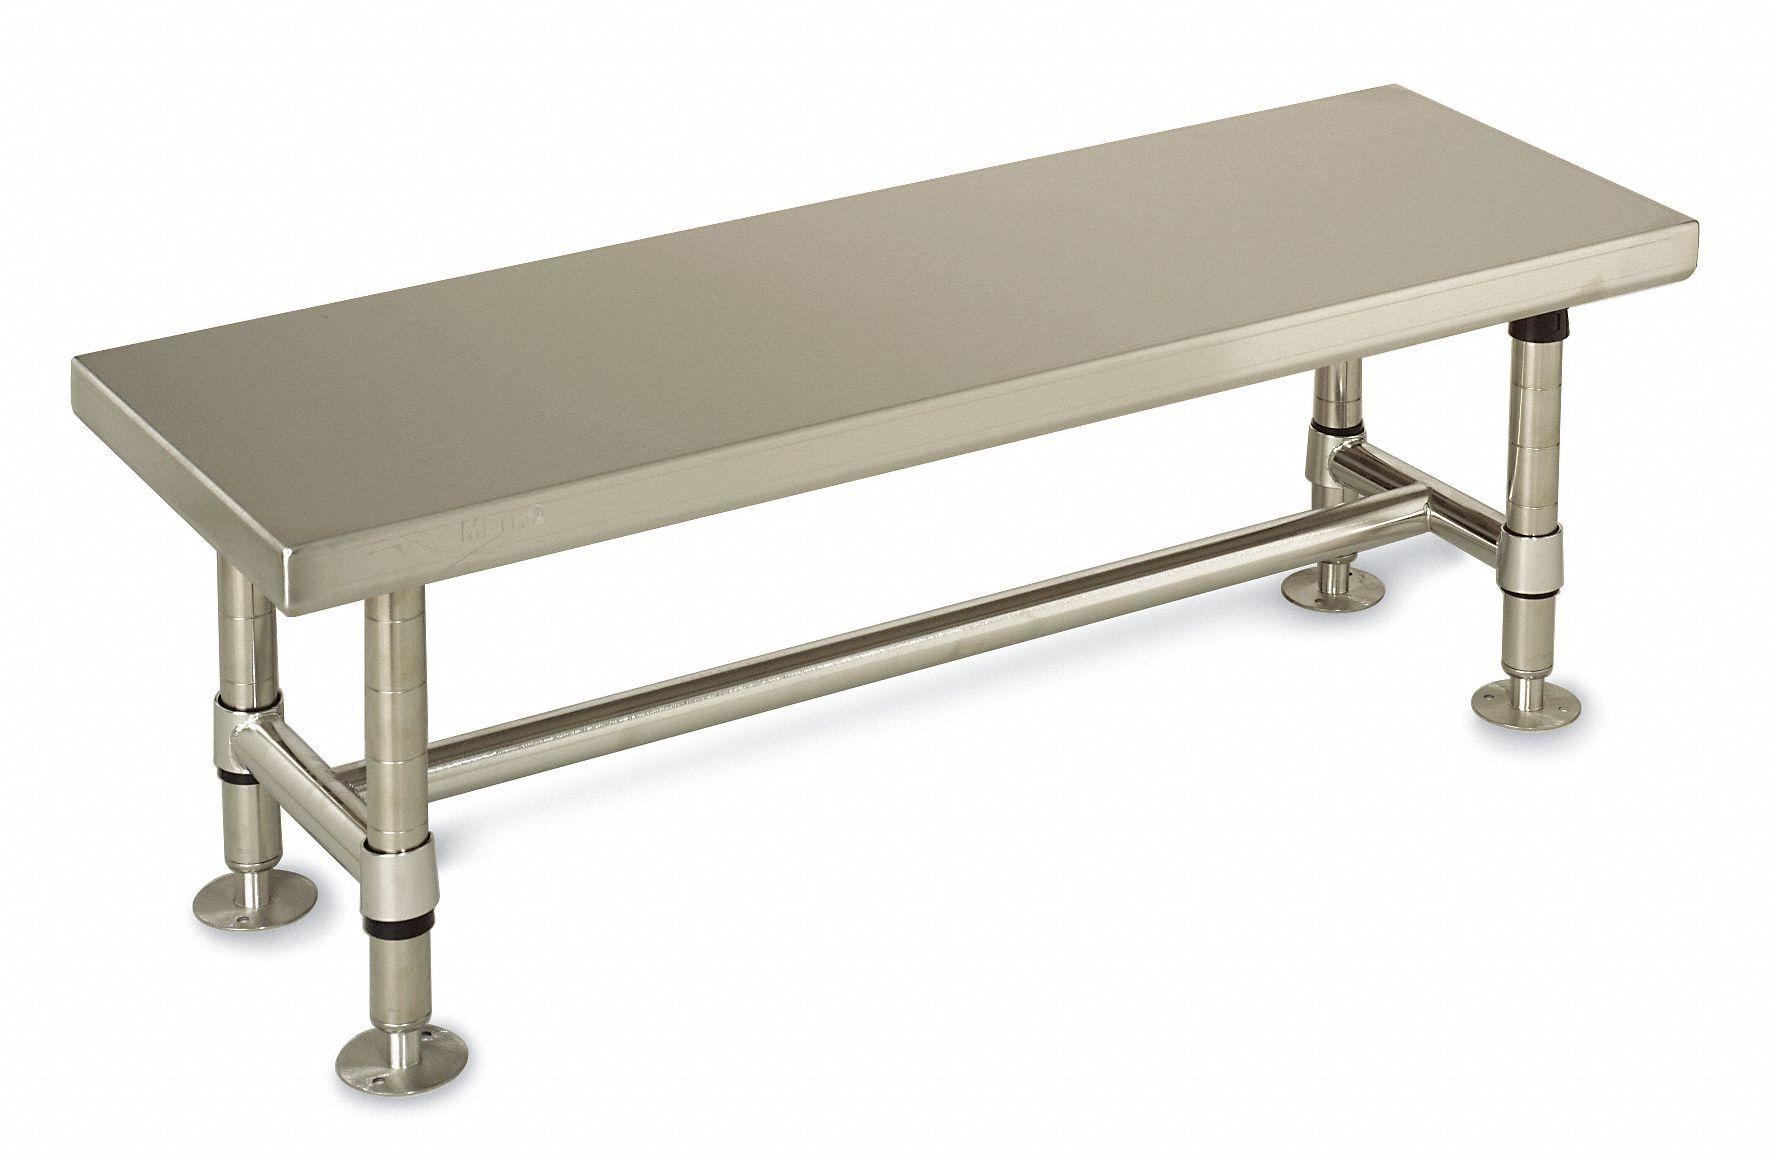 metro cleanroom gowning bench,36 in - 3ldk2|gb1636s - grainger